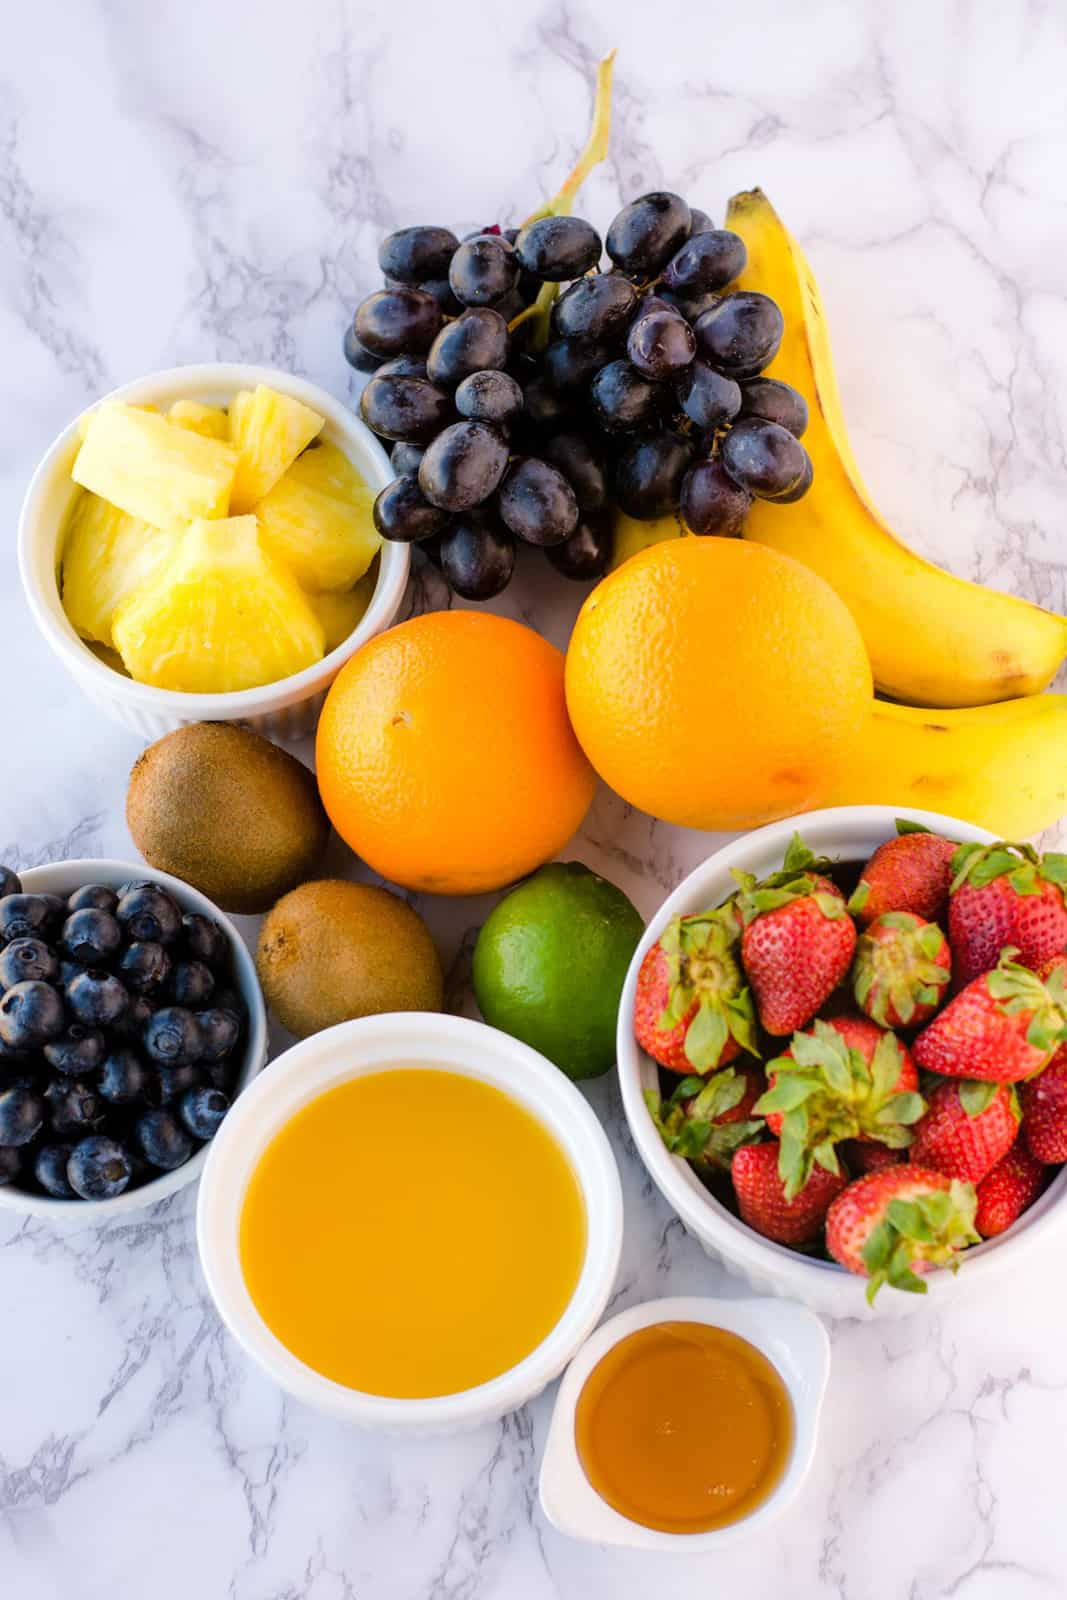 Ingredients needed to make Fruit Salad